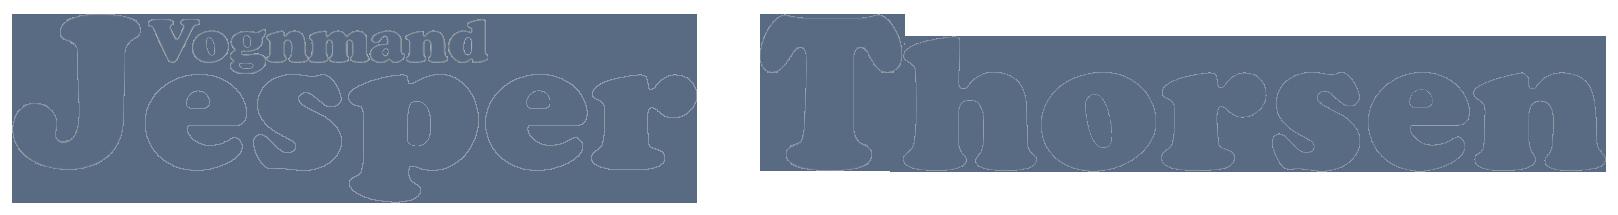 Vognmand Jesper Thorsen Logo